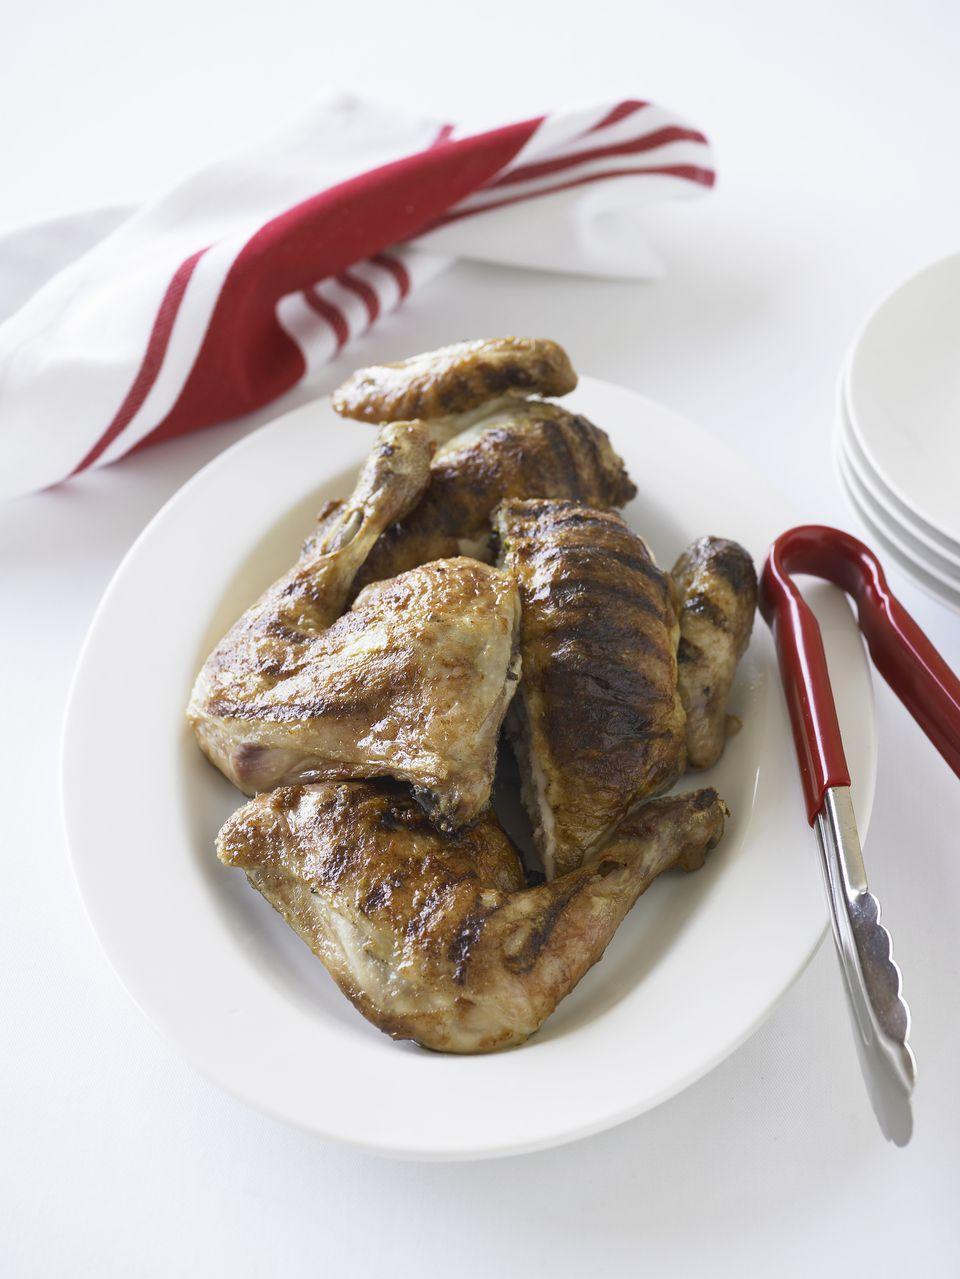 Roast chicken legs